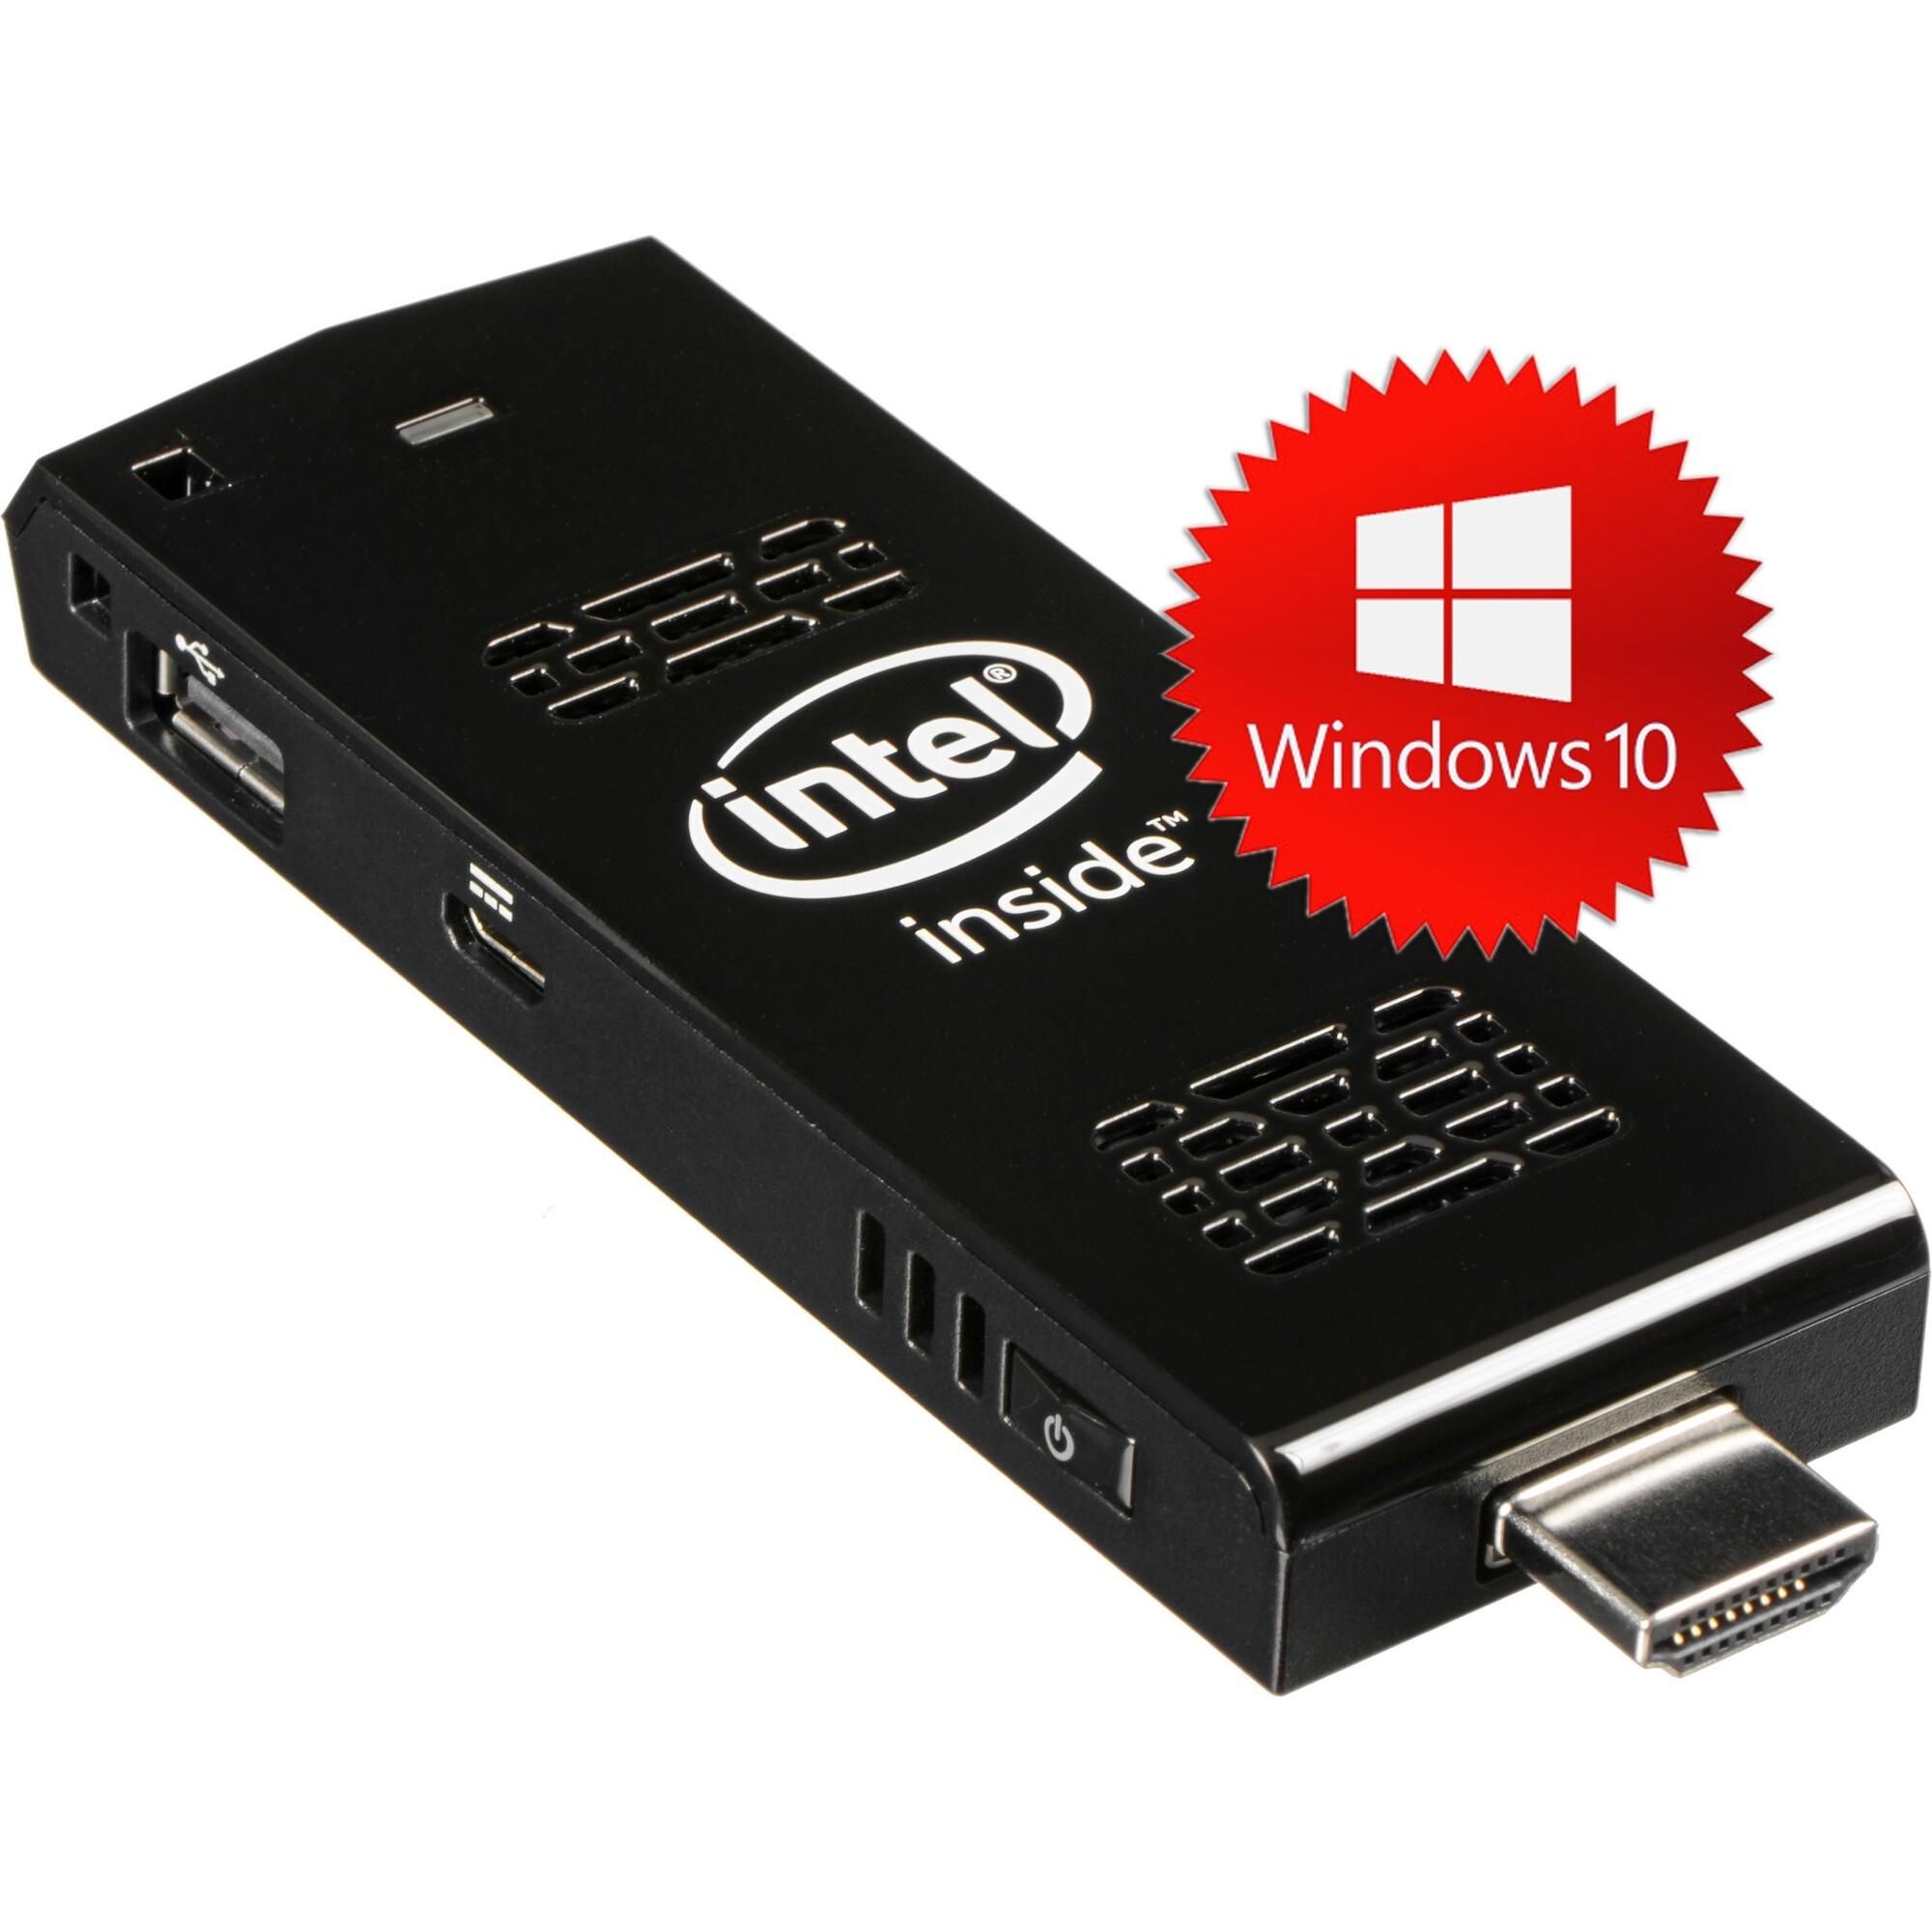 Mini Sistem PC Intel Compute Stick Intel Atom Z3735F Up To